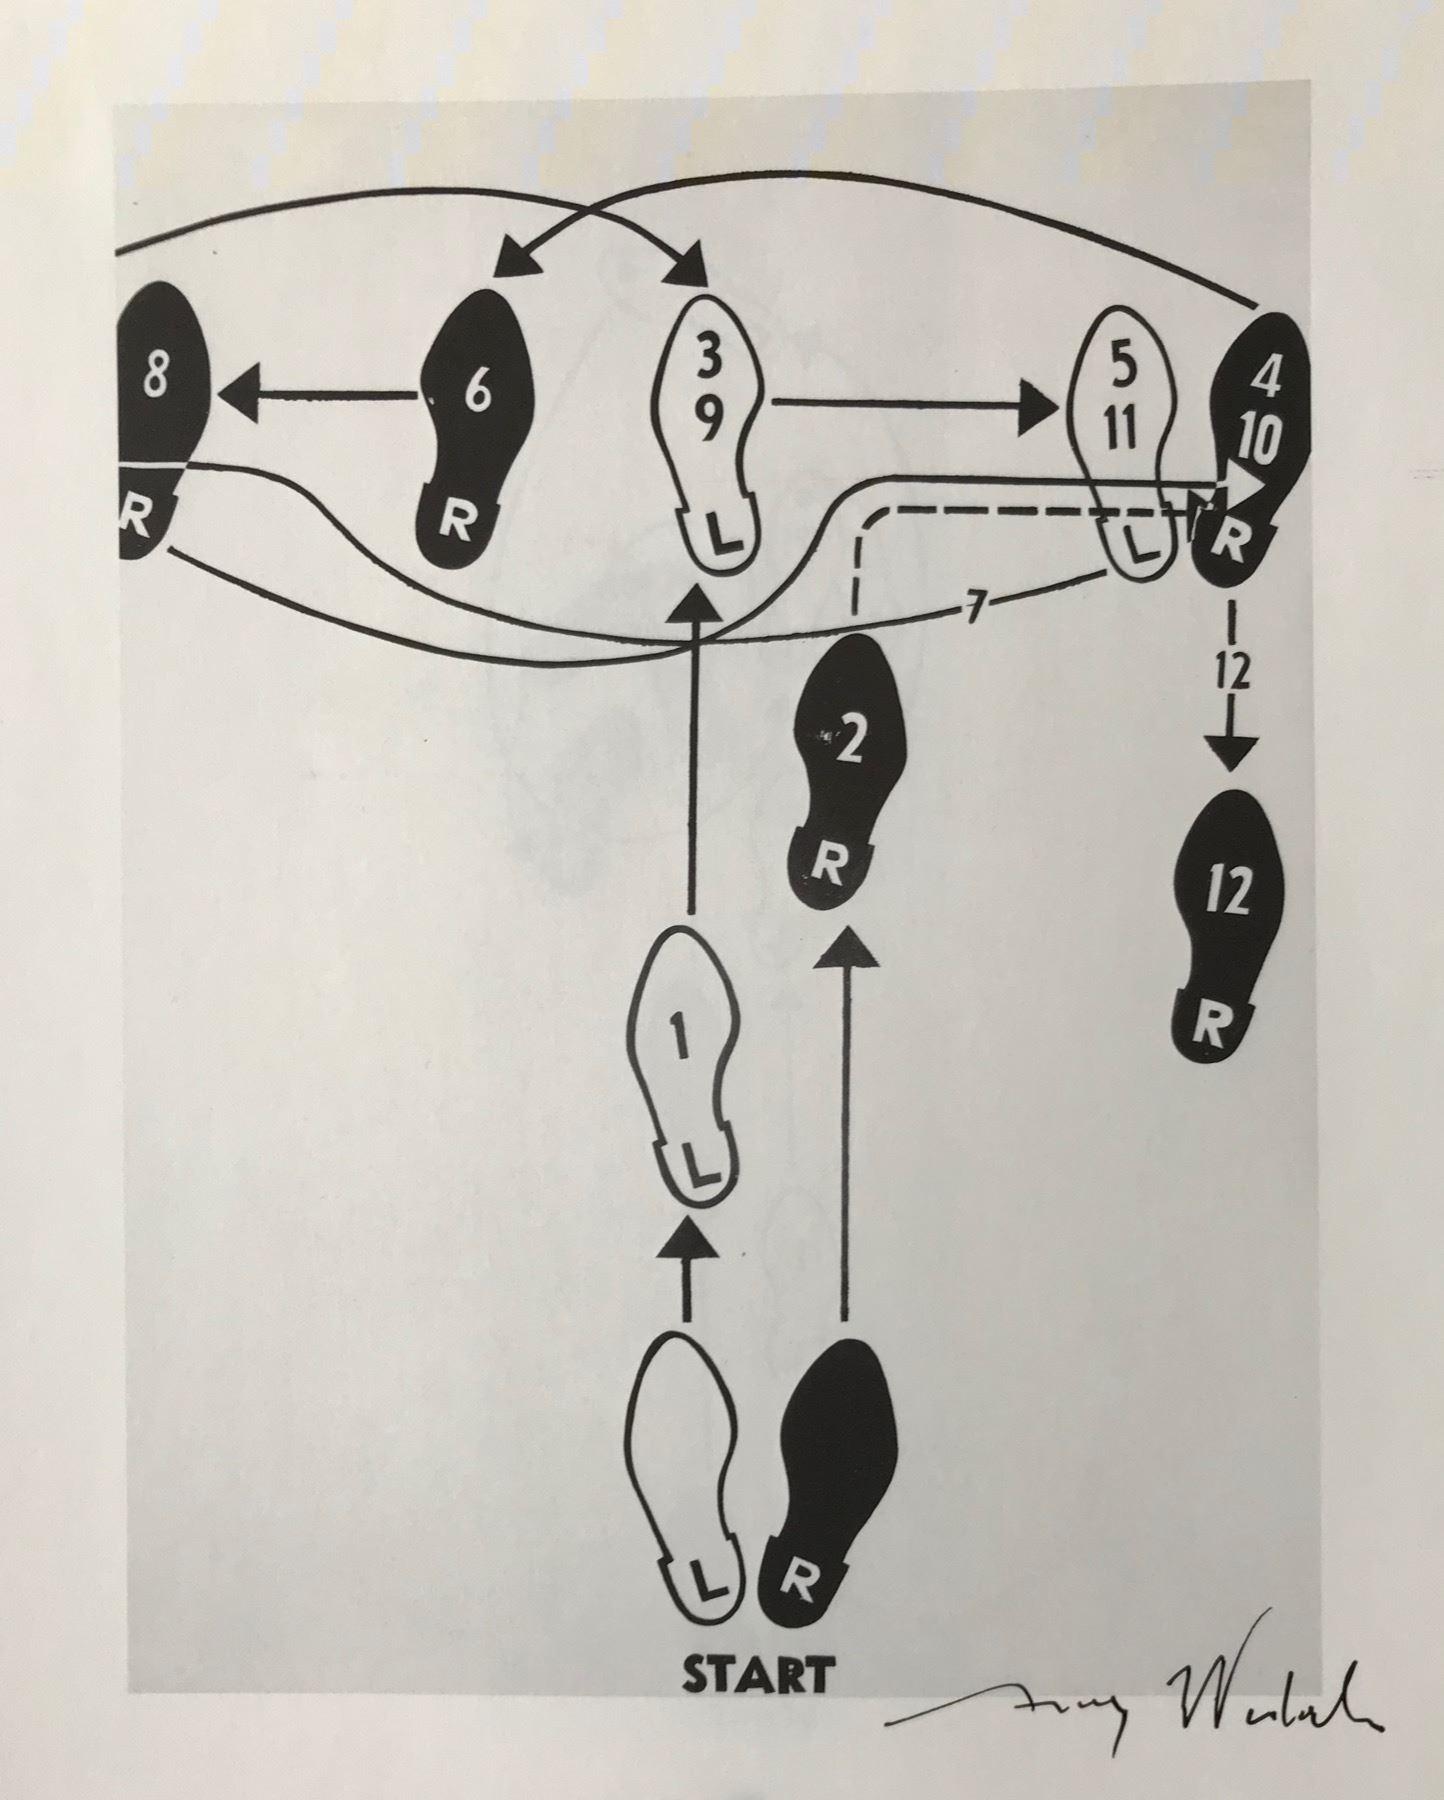 dance diagram andy warhol andy warhol   dance diagram  signed print  1986  andy warhol   dance diagram  signed